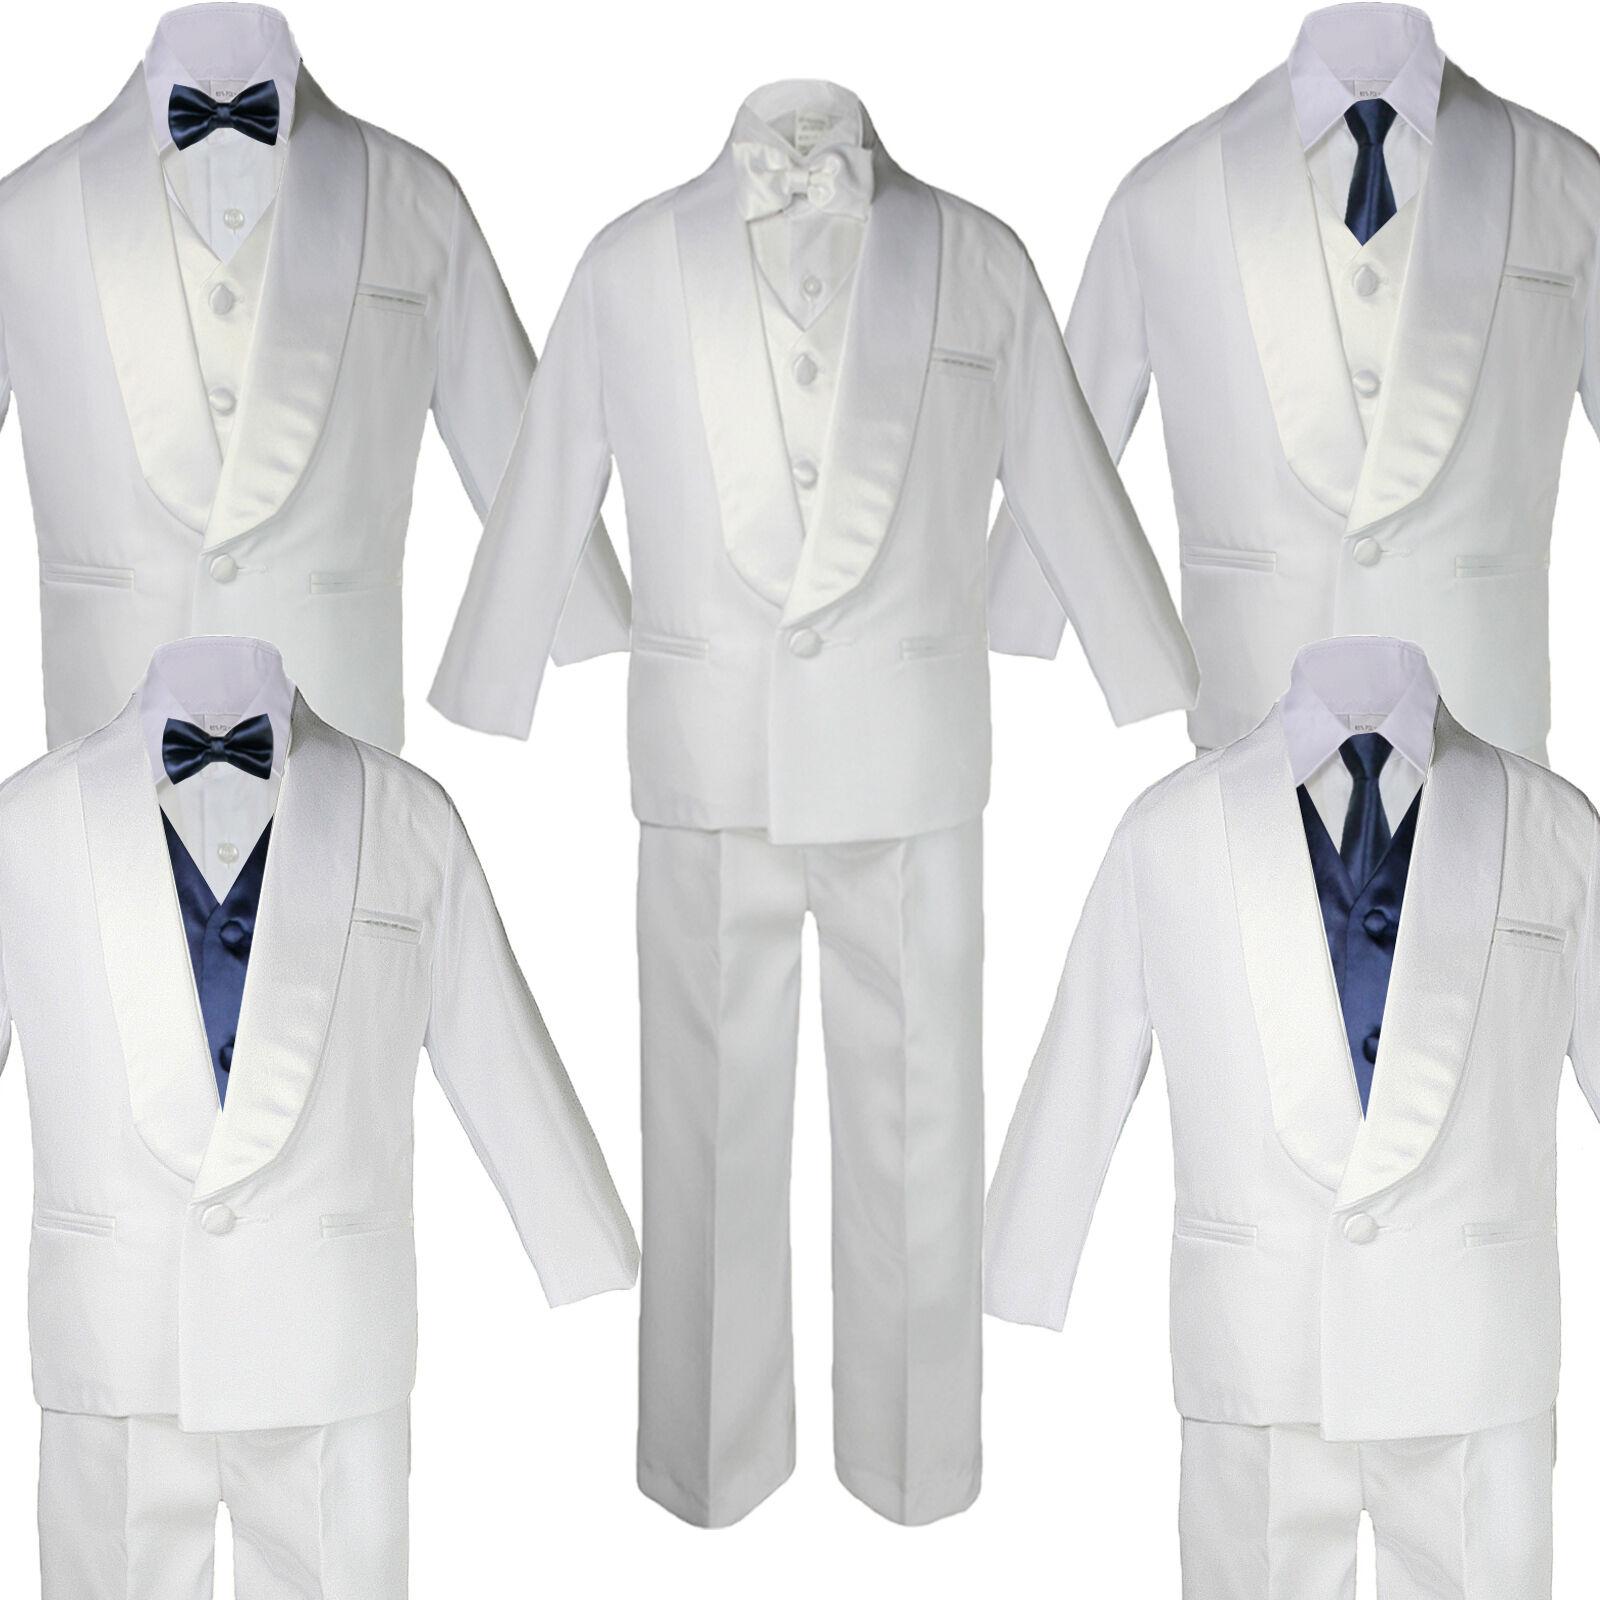 5-7pc Baby White Satin Shawl Lapel Suits Tuxedo Navy Blue...